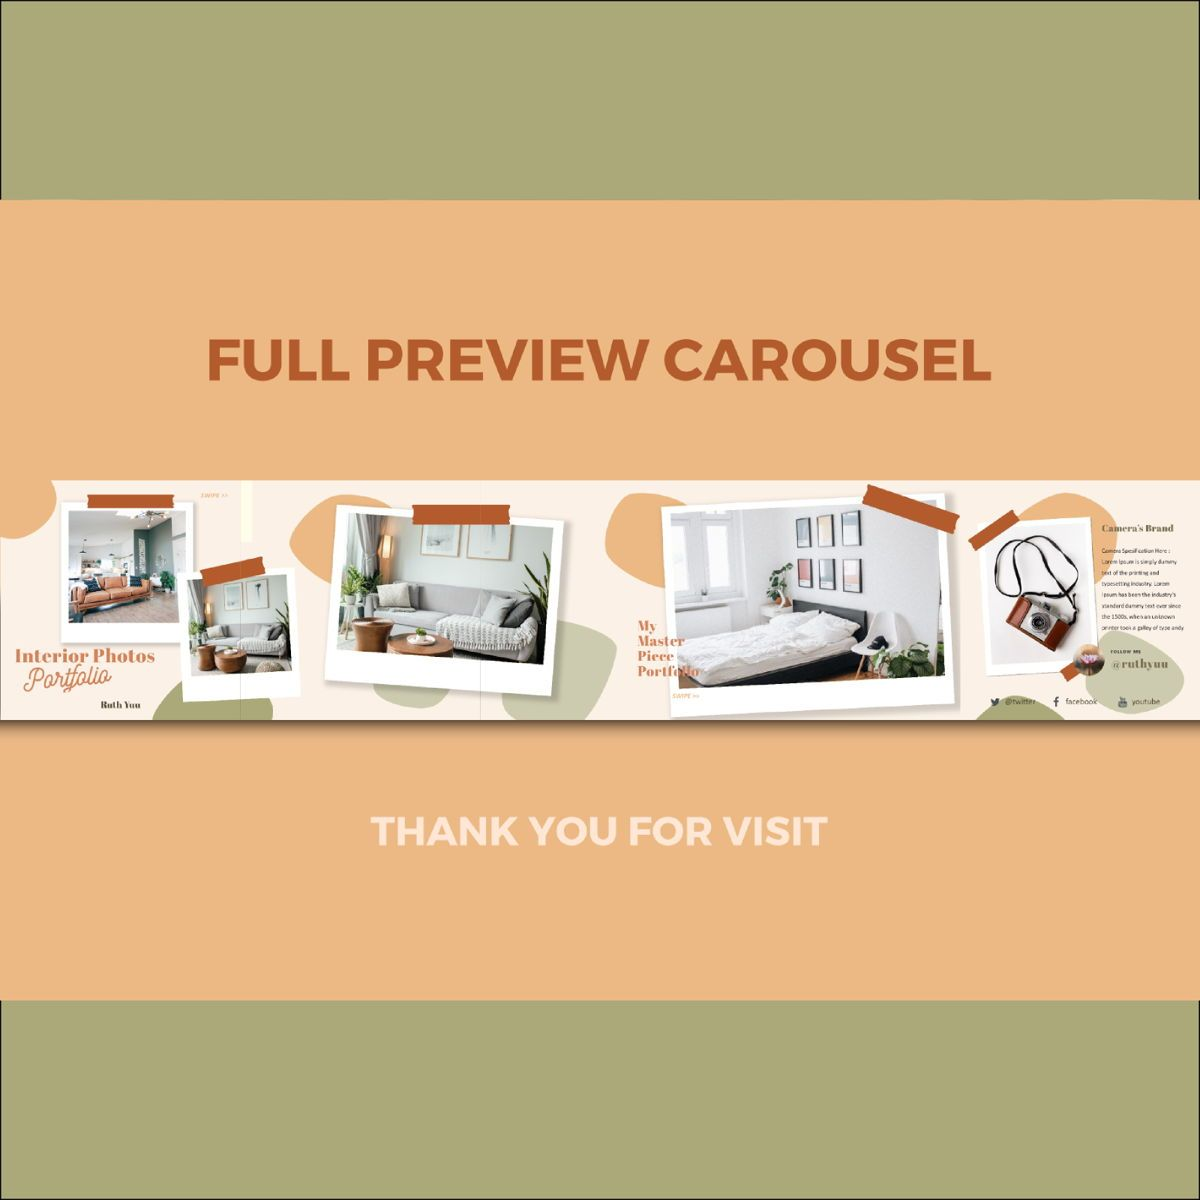 Mini online interior photography portfolio instagram carousel powerpoint template, Slide 3, 07120, Presentation Templates — PoweredTemplate.com